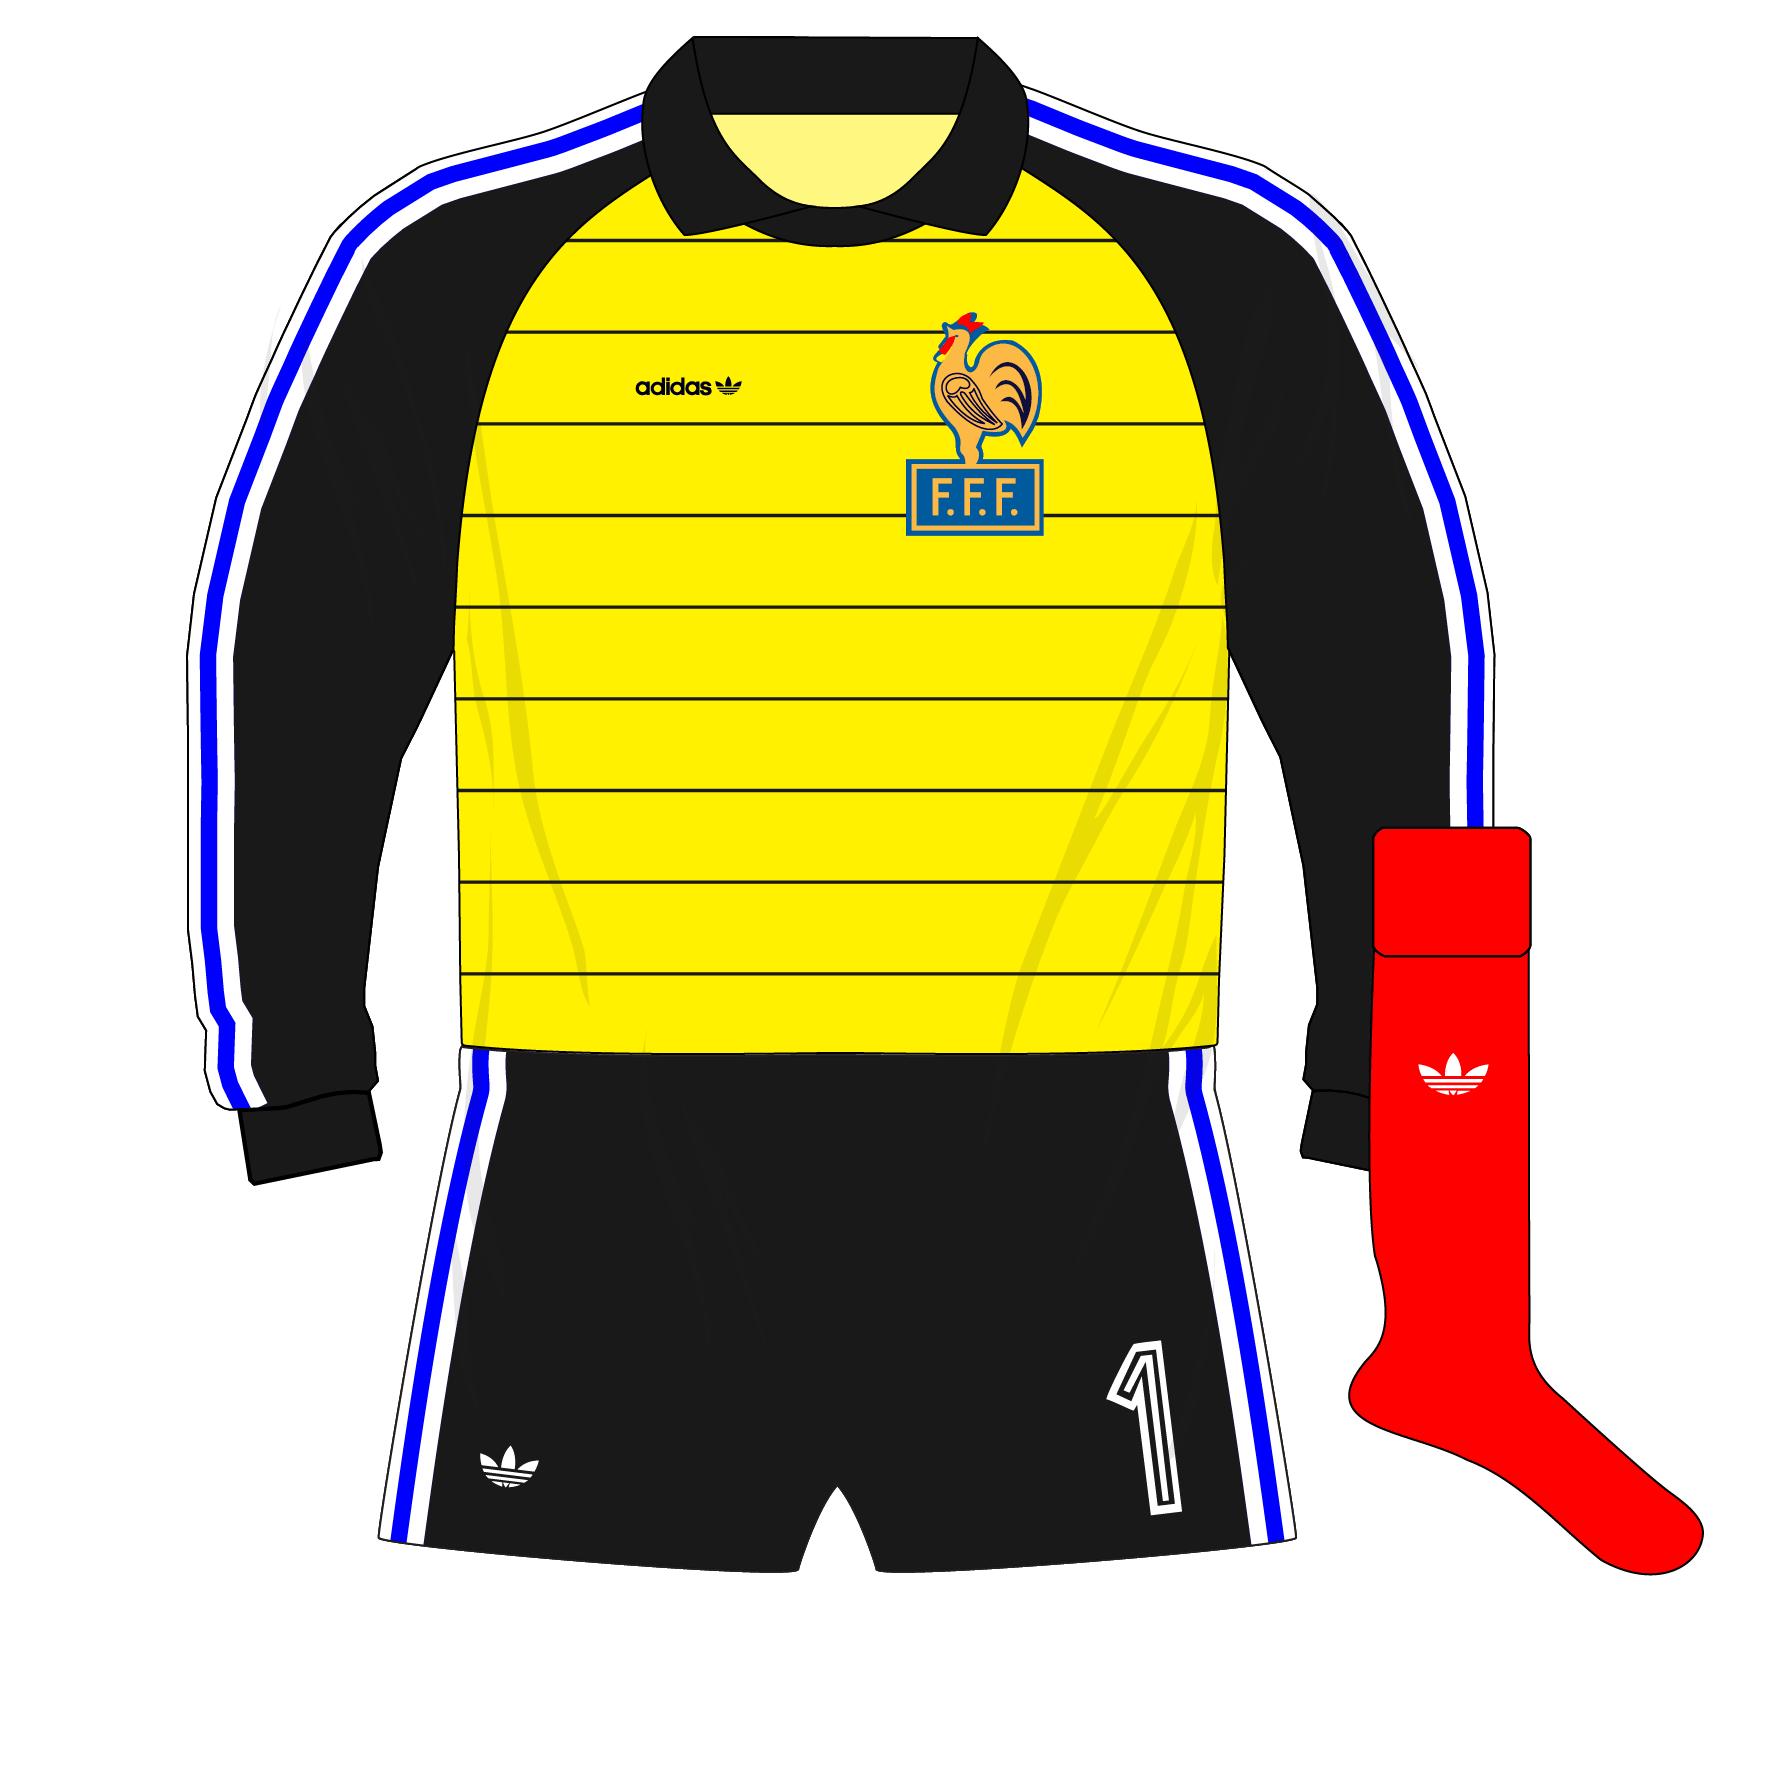 huge discount ed484 44c02 The evolution of adidas goalkeeper shirt designs – Part 2 ...